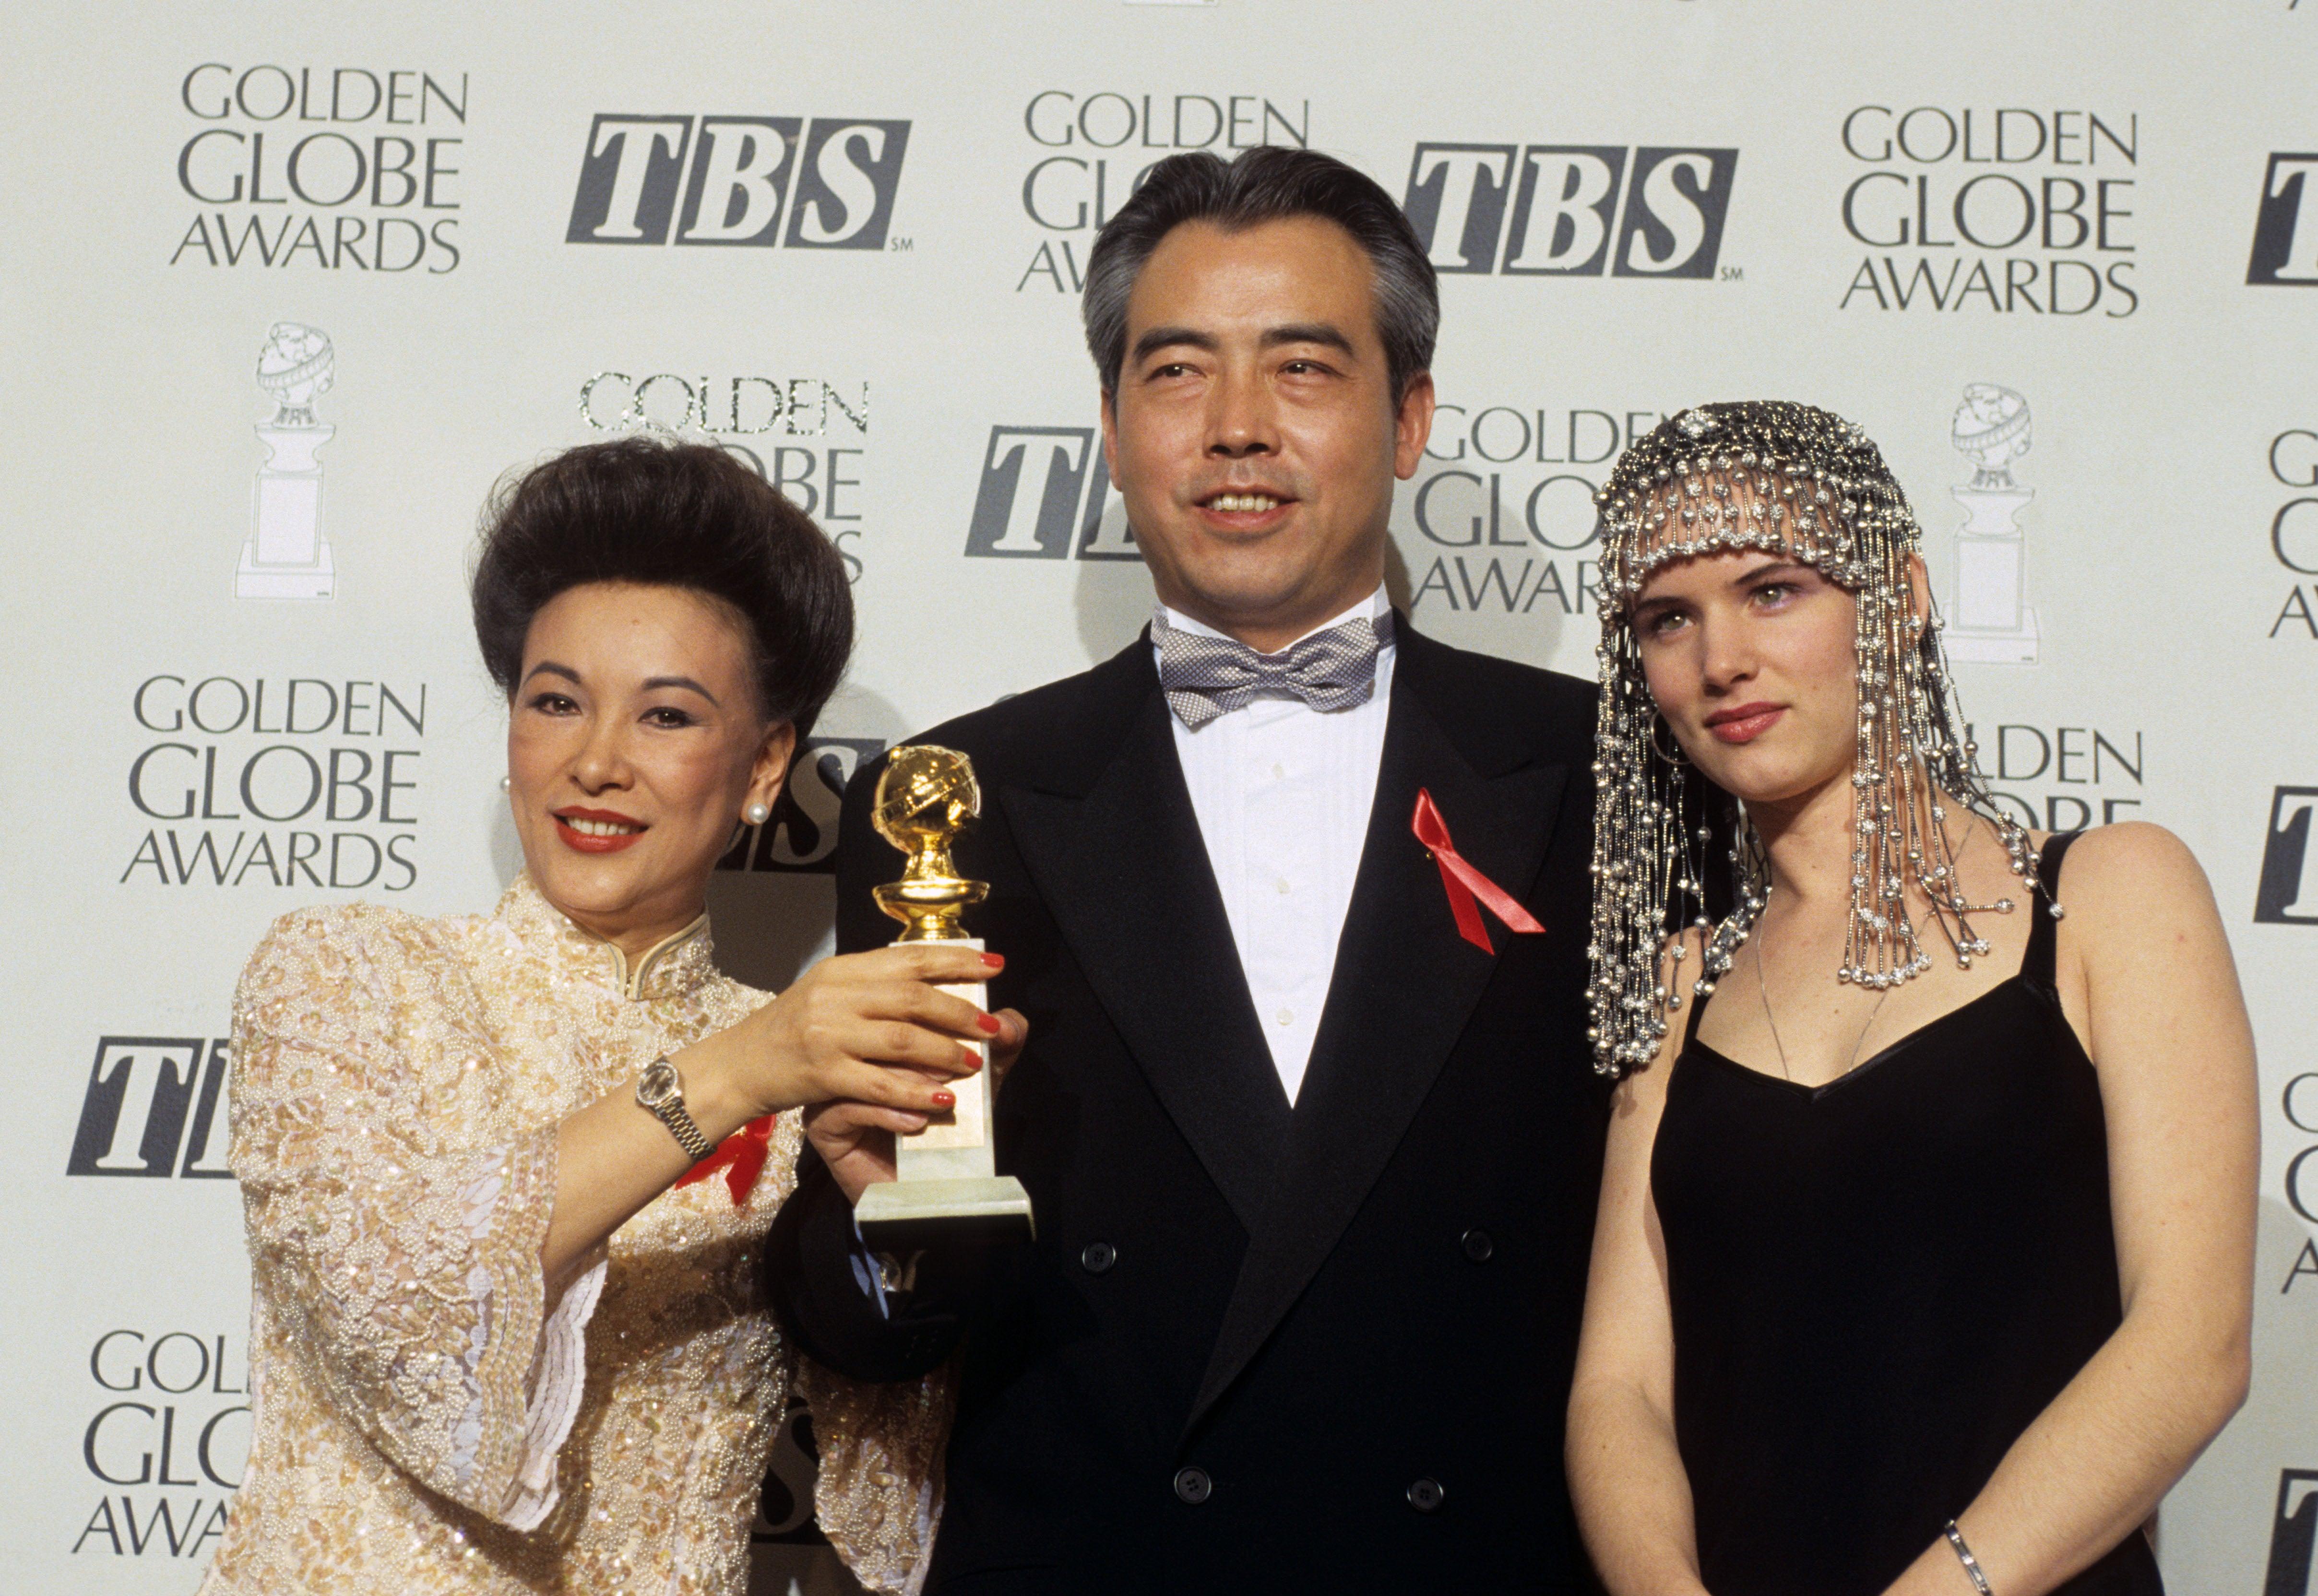 1994_gg51_hsu_feng_chen_kaige_foreign-farewell_my_concubine_juliette_lewis_2w.jpg